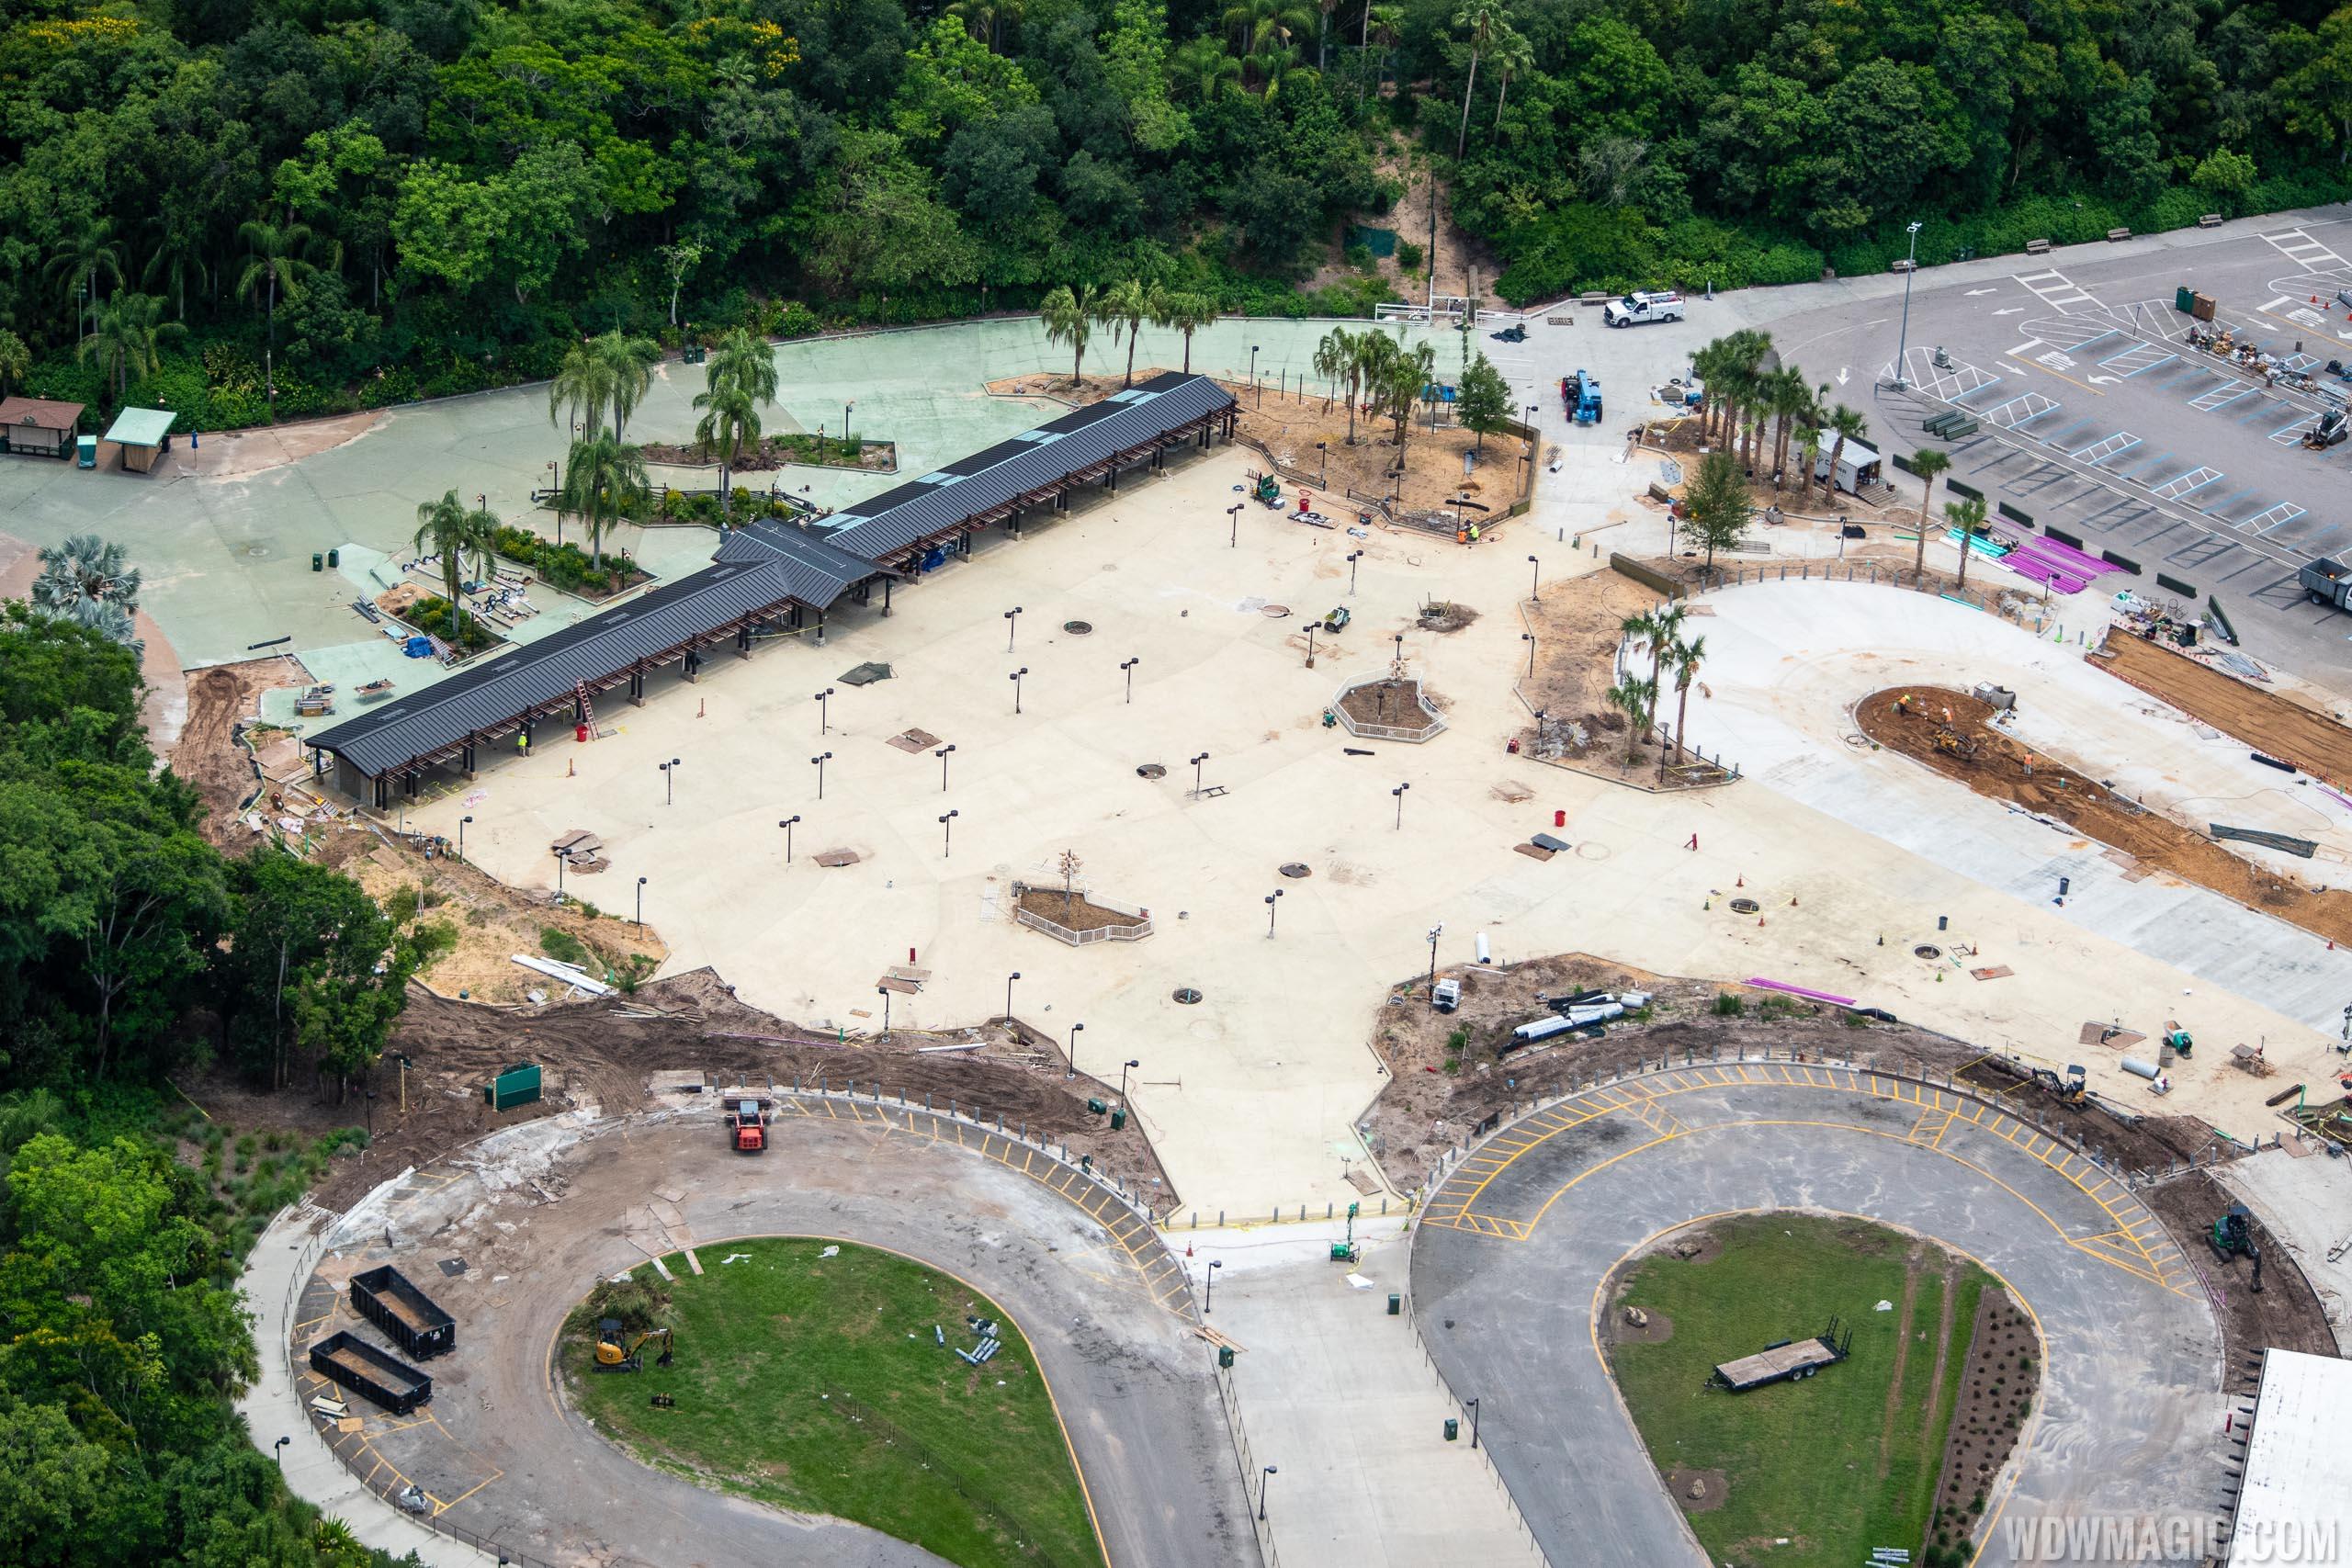 Disney's Animal Kingdom main entrance construction - June 2020